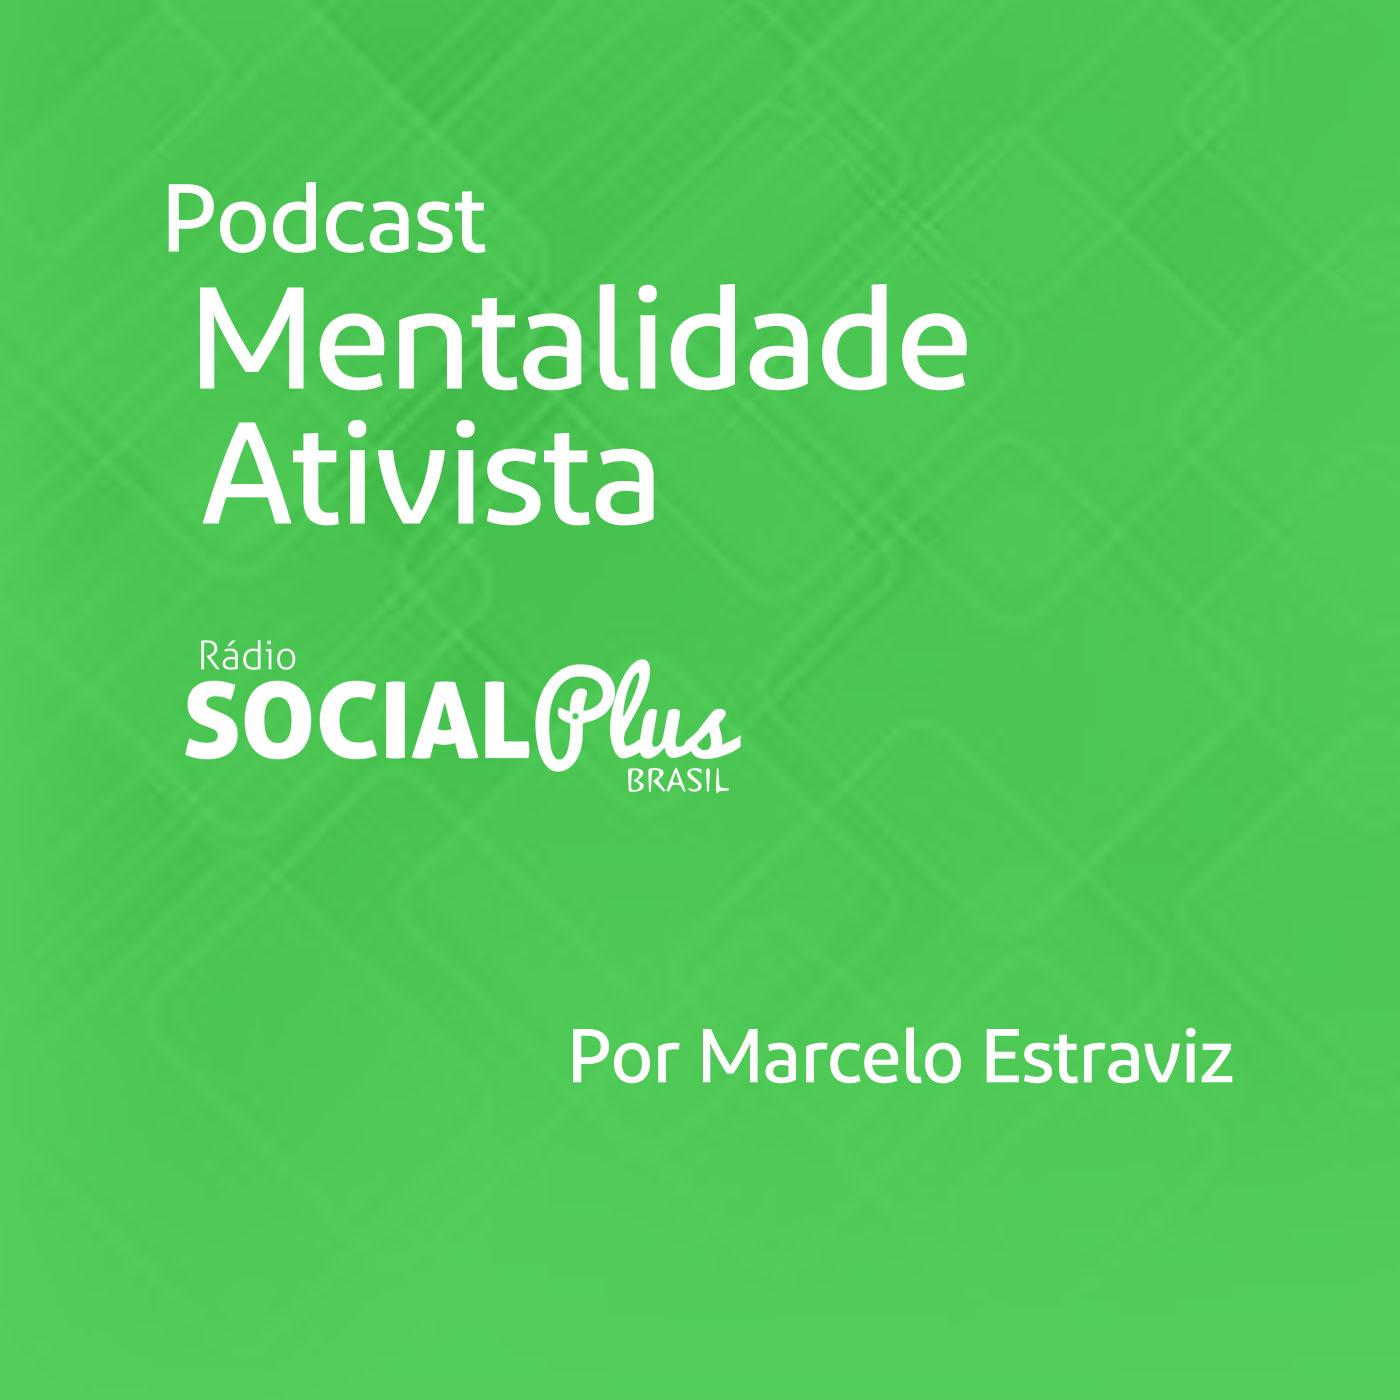 Radio Social Plus Brasil